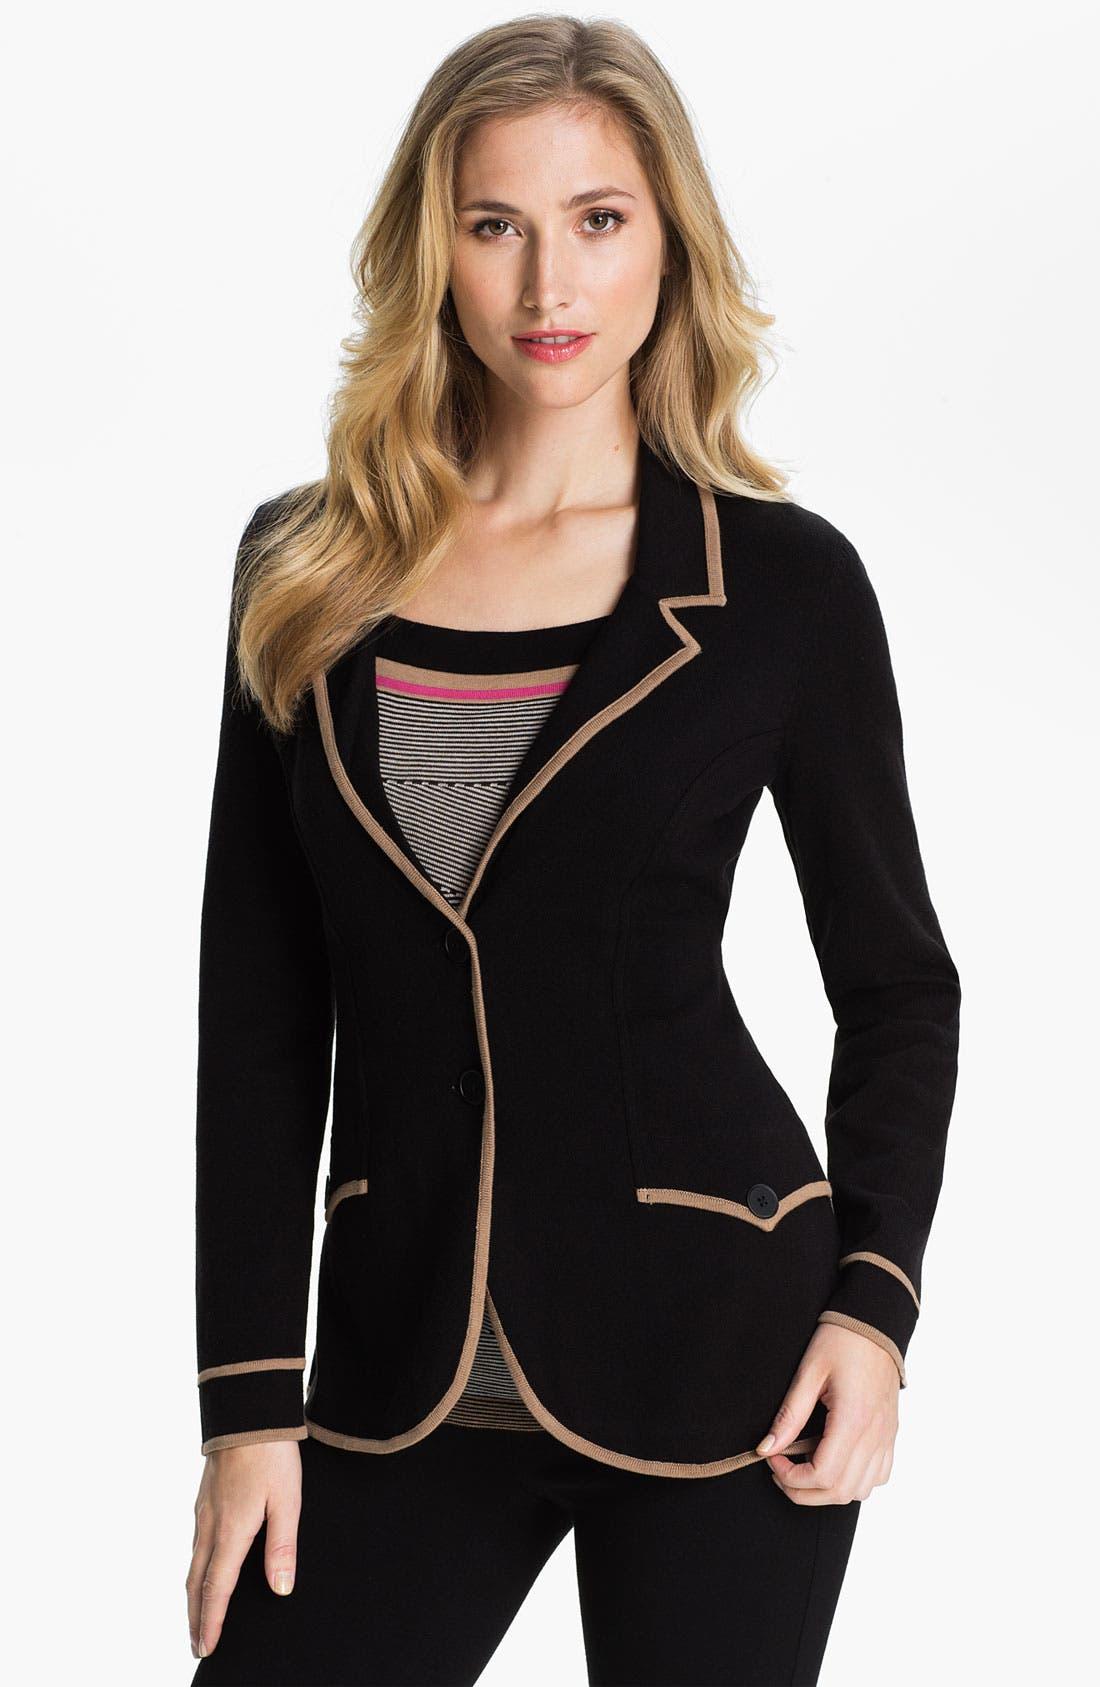 Alternate Image 1 Selected - Nic + Zoe Tipped Sweater Jacket (Petite)